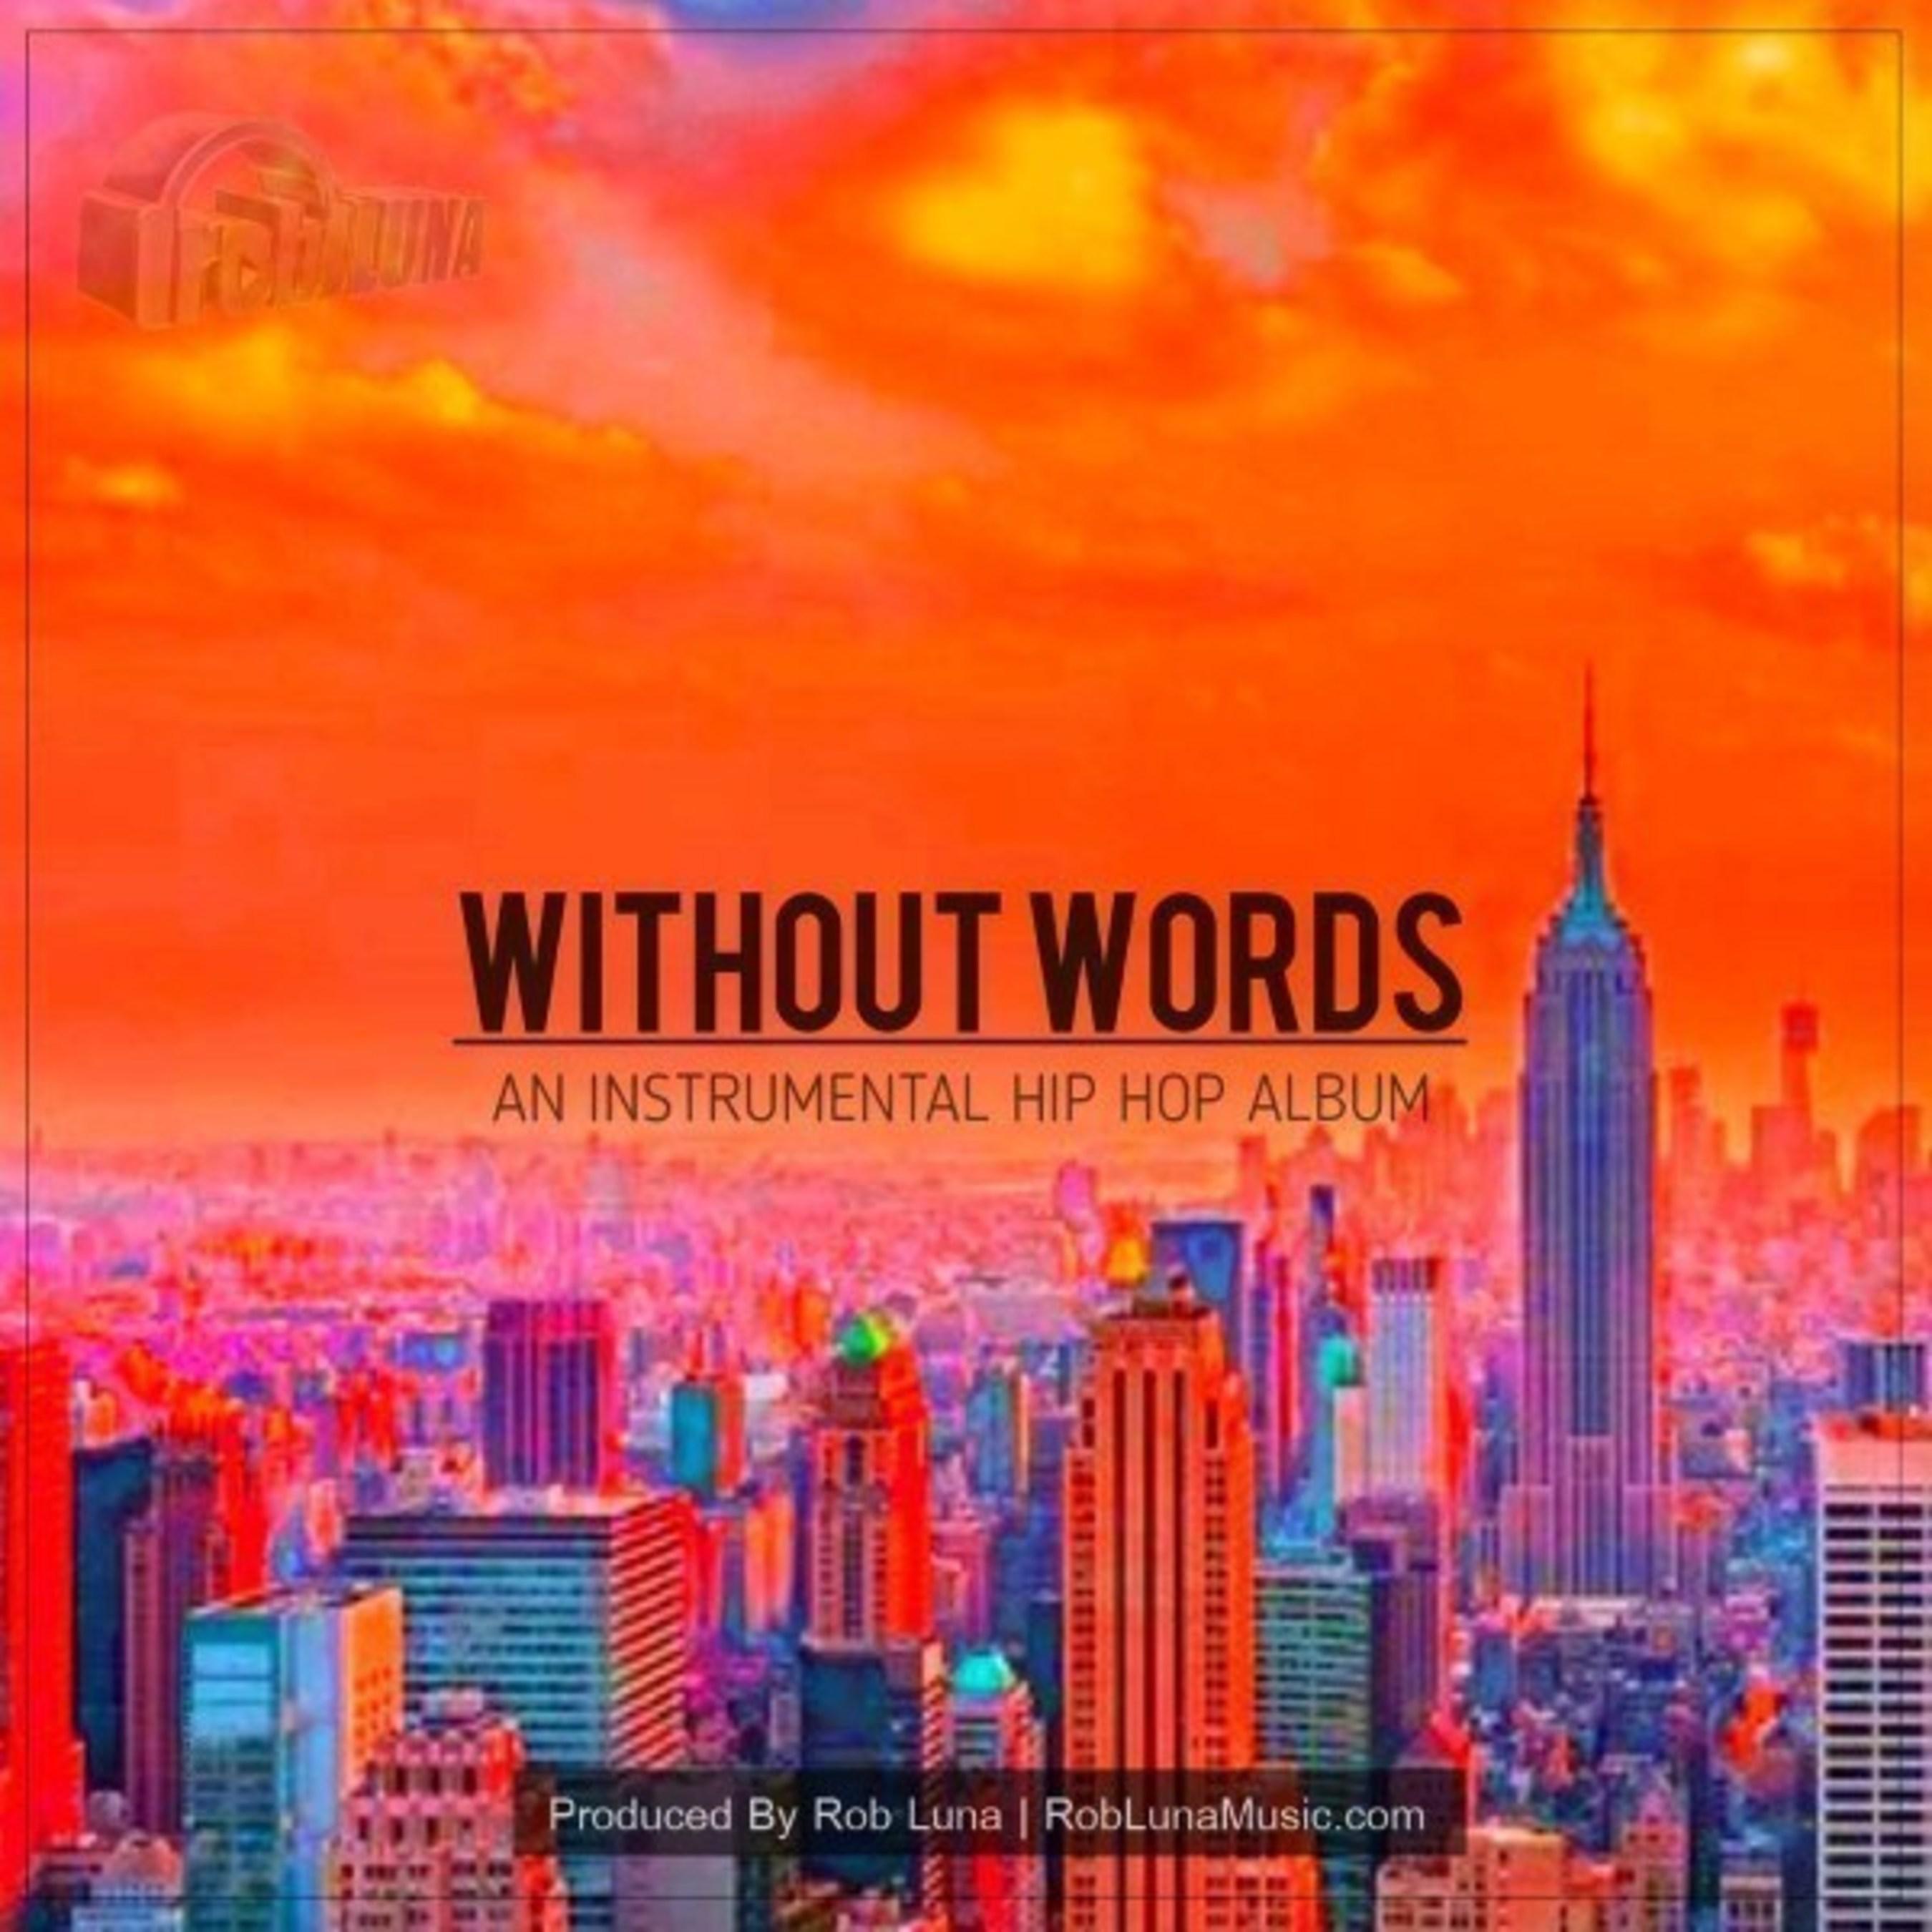 Rob Luna Announces the Release of His Debut Album